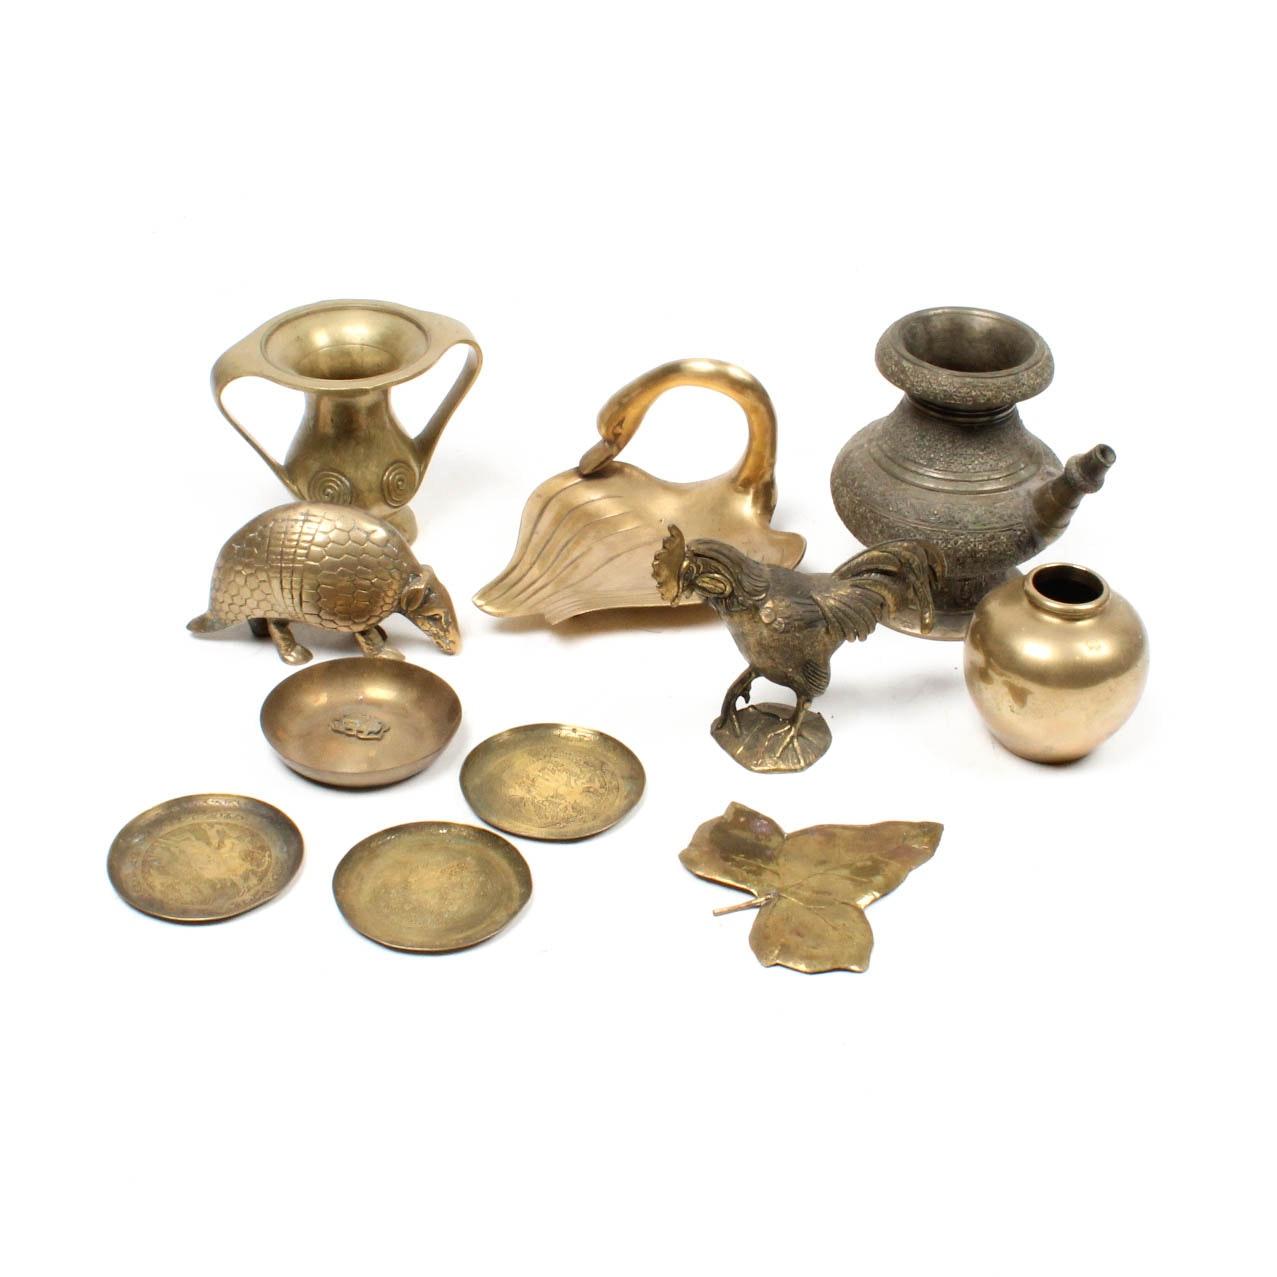 Assorted Brass Home Decor